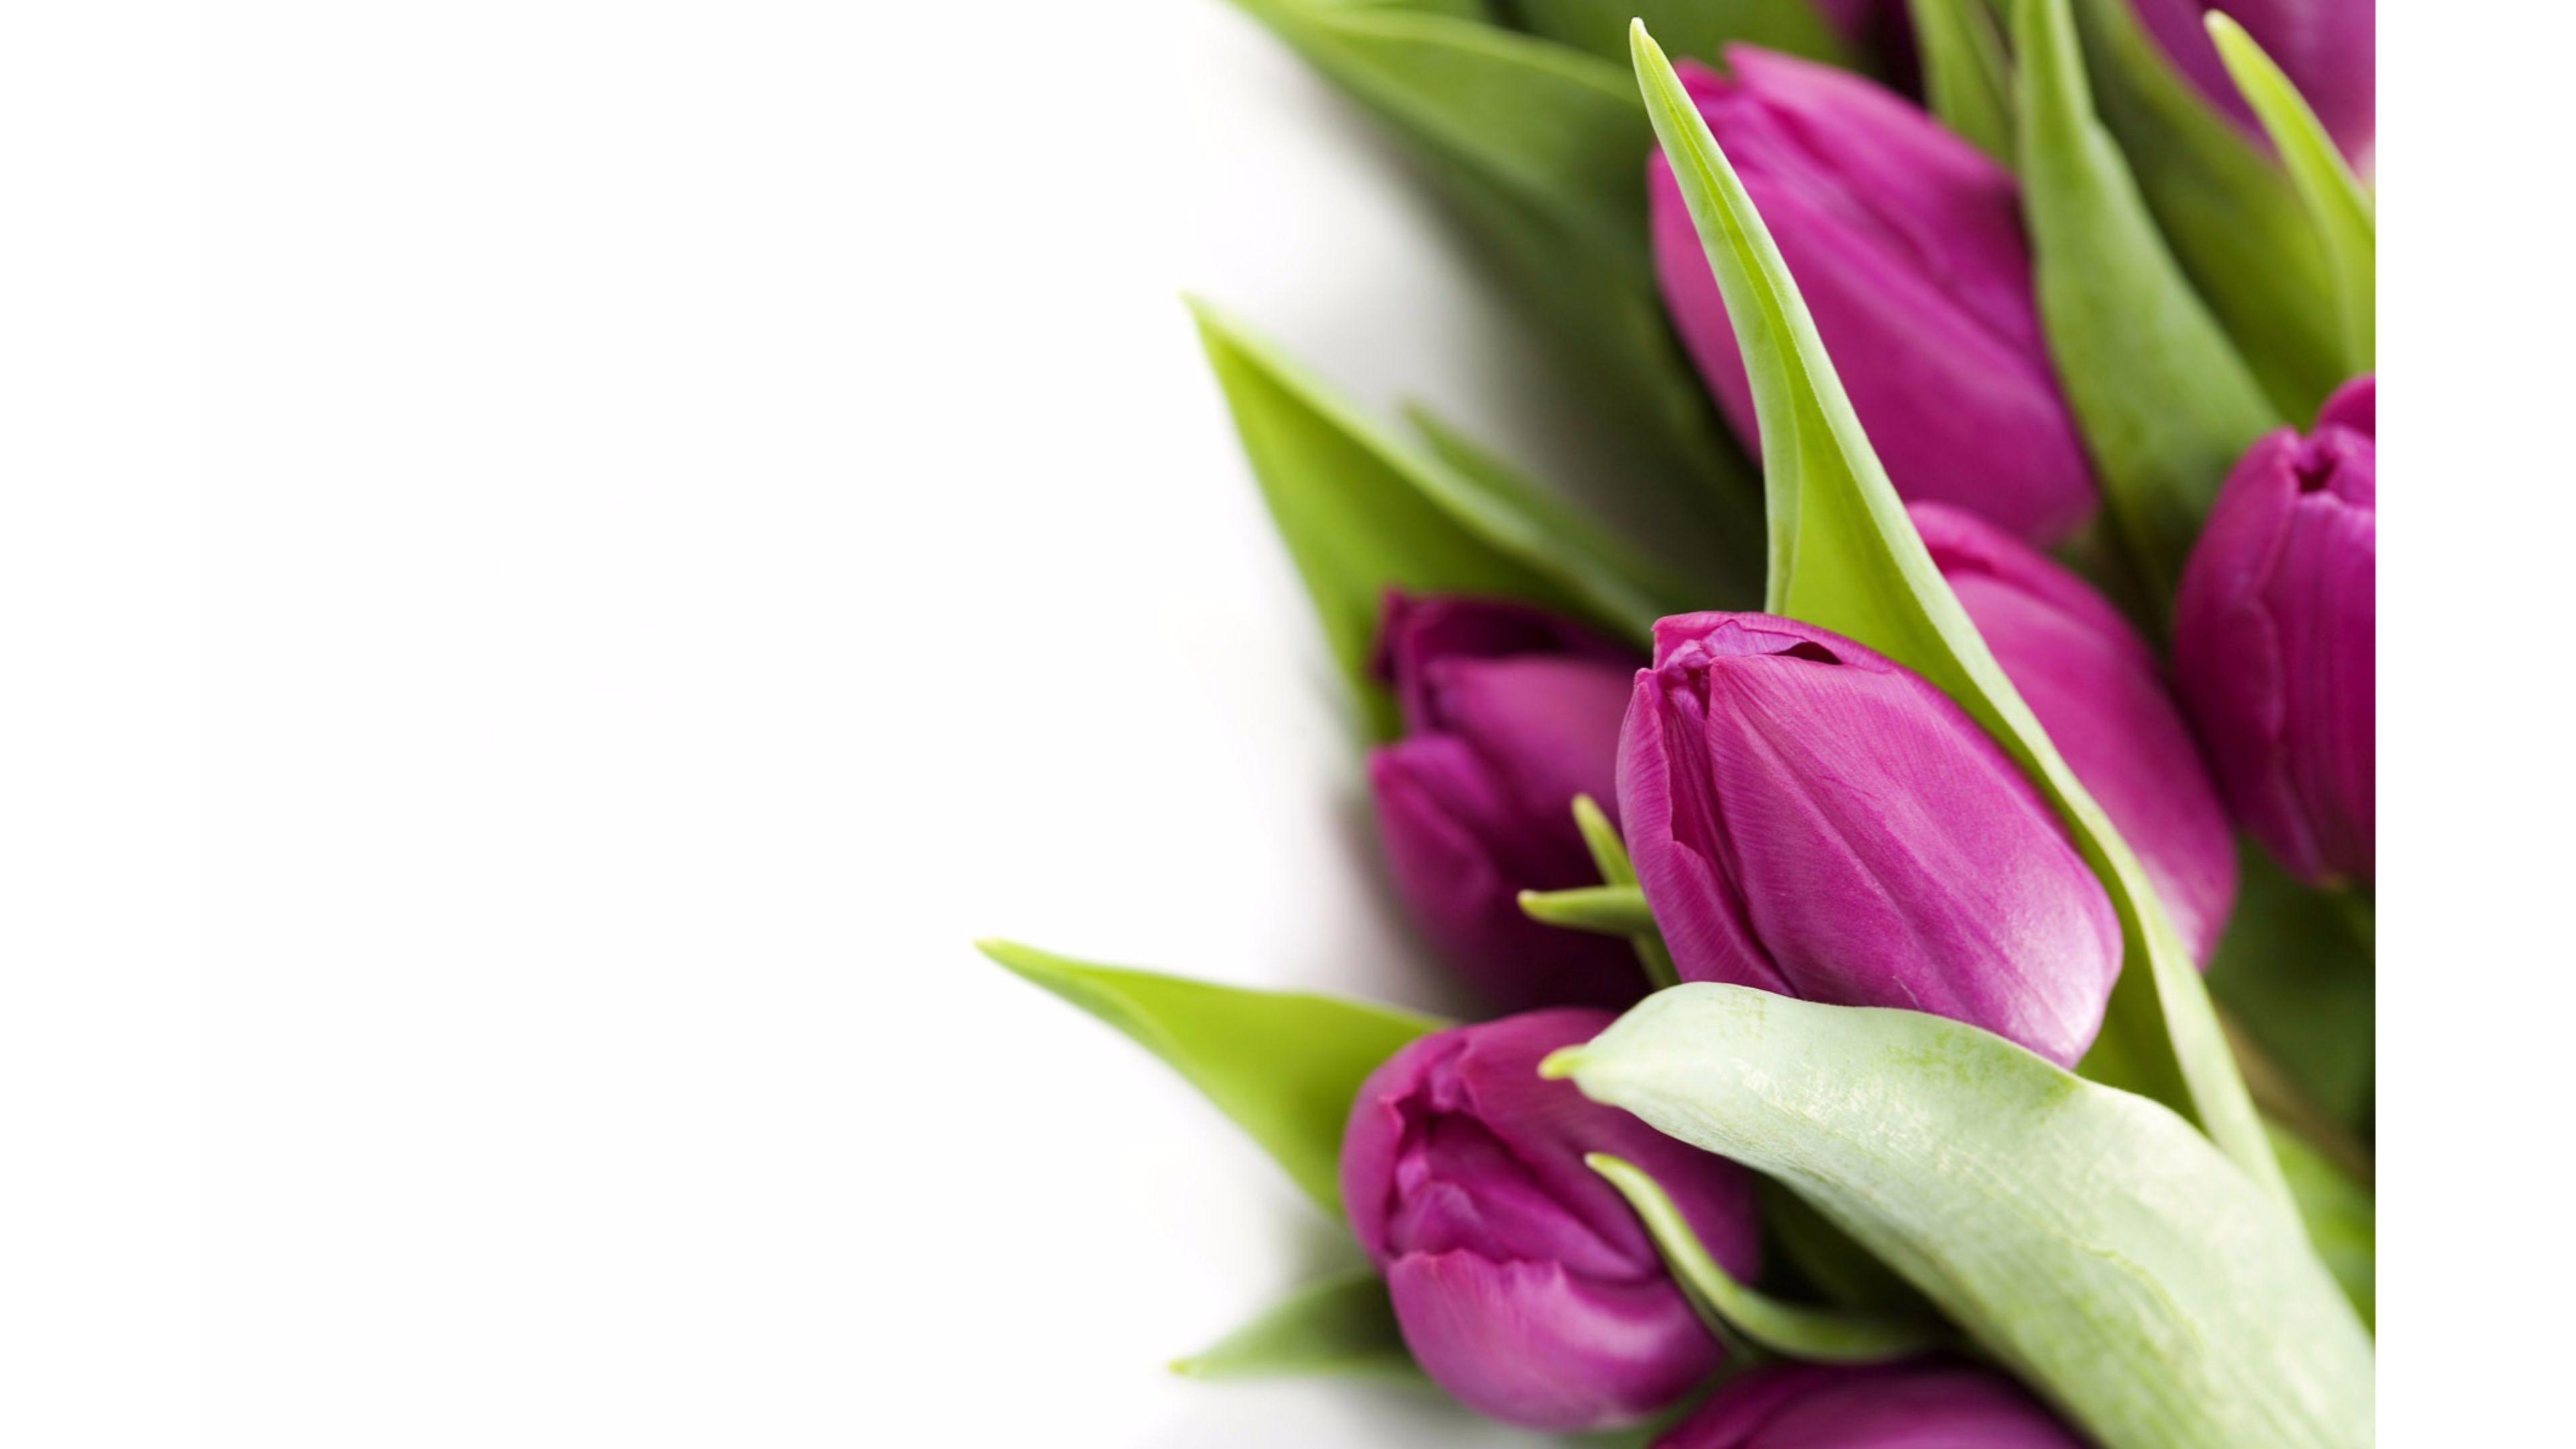 Violet 4K Tulips Wallpaper